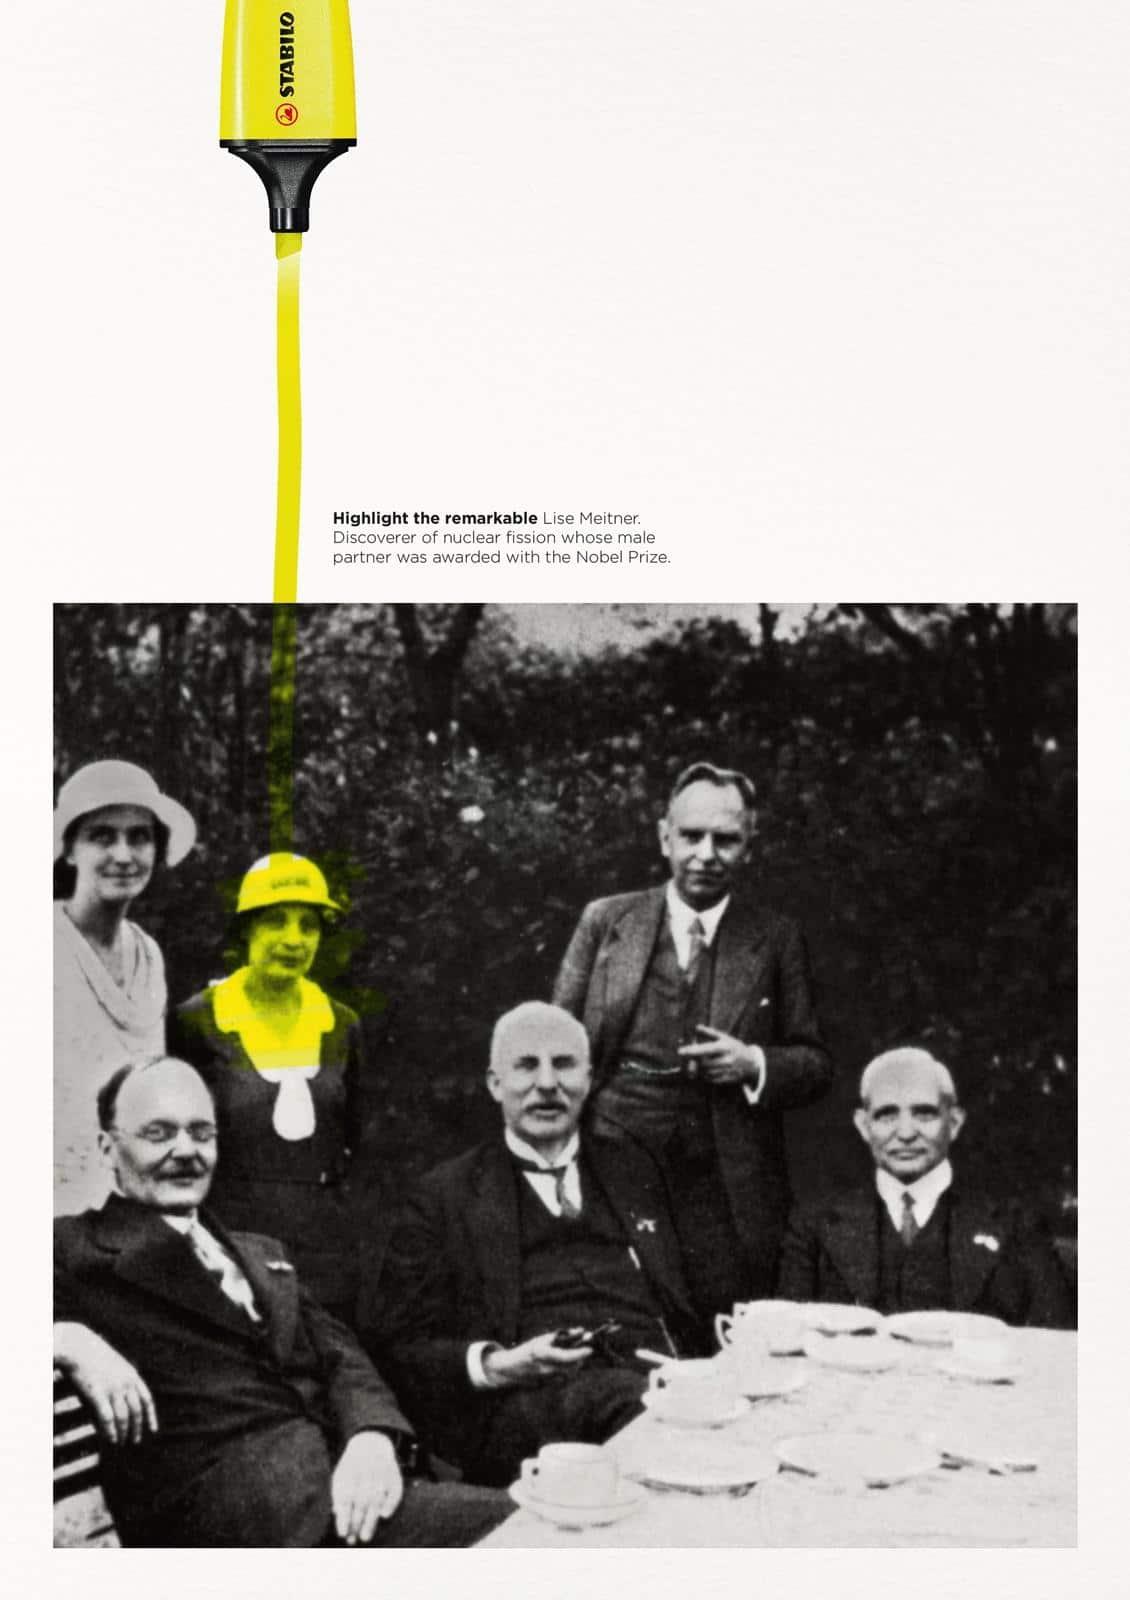 affiche stabile Lise Meitner